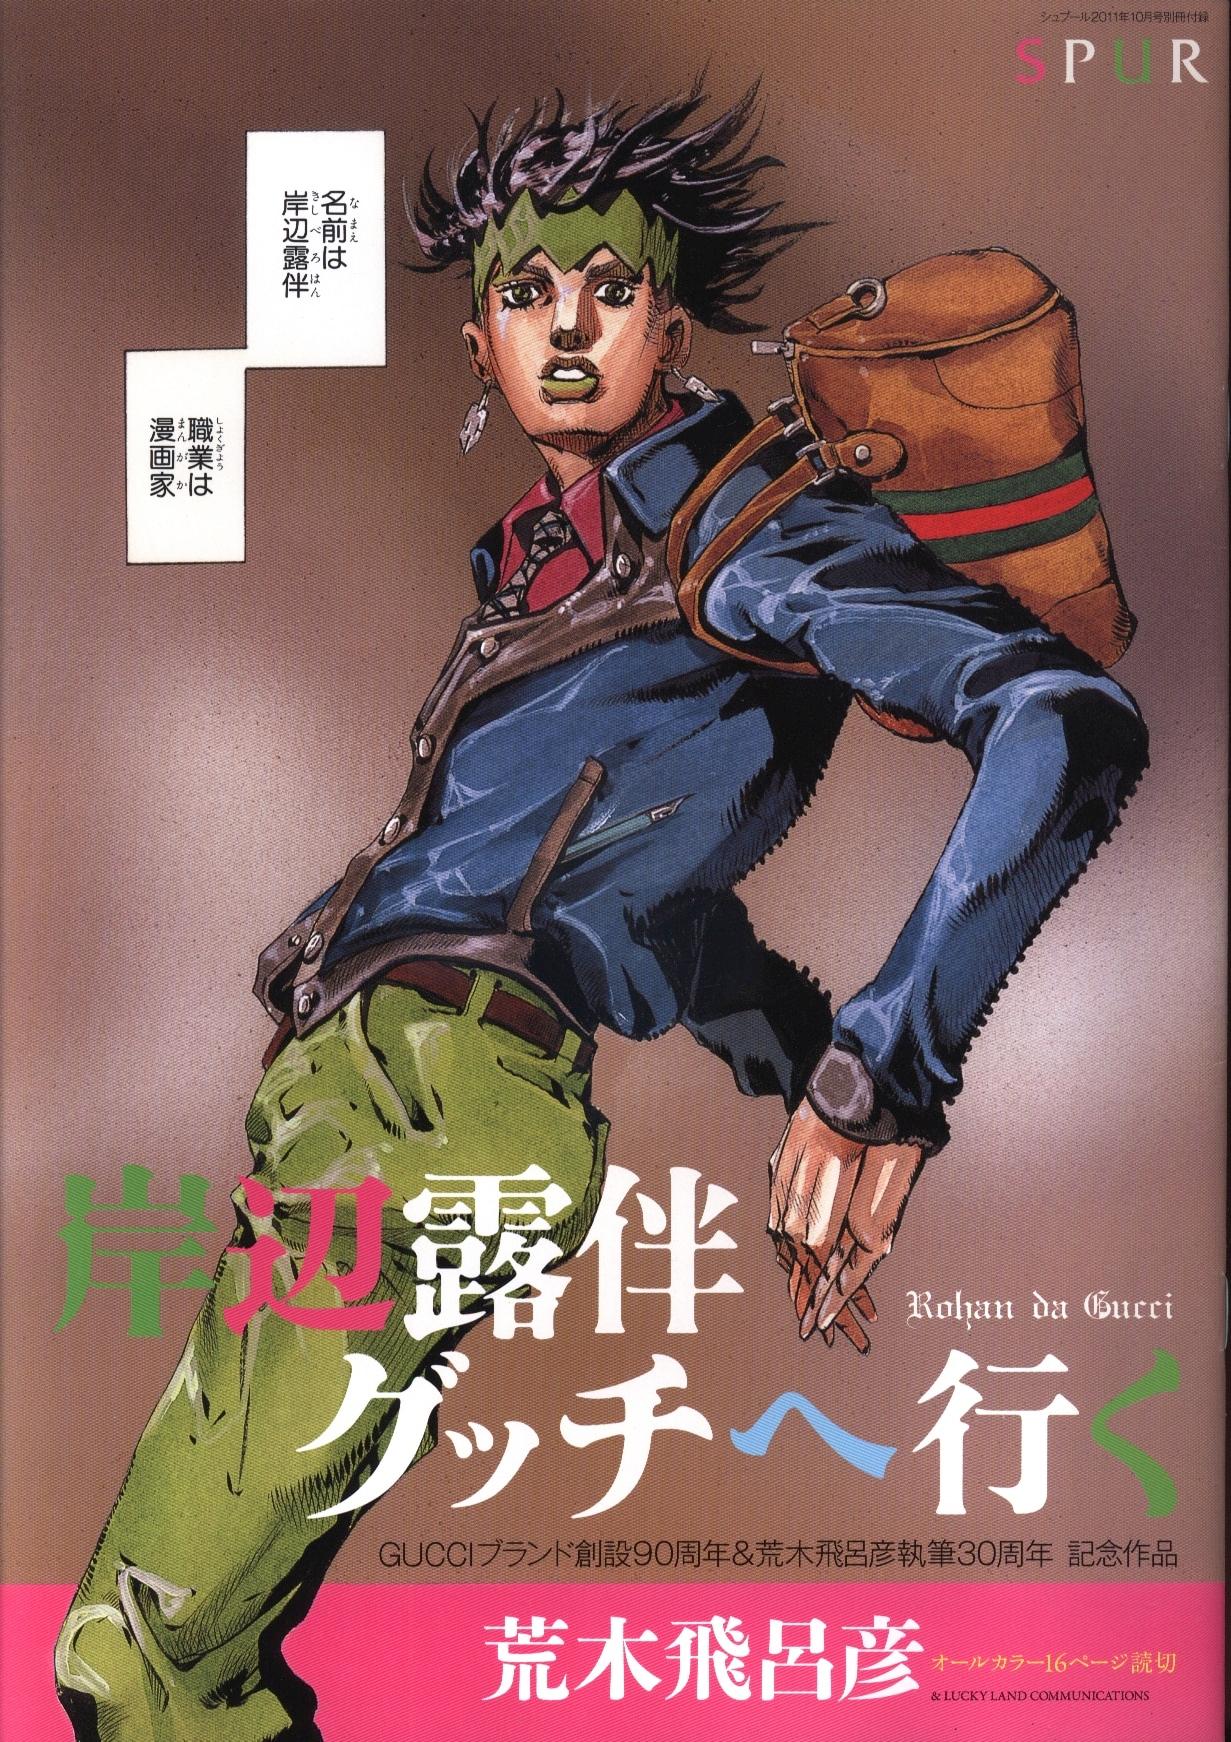 Kishibe Rohan Meets Gucci - JoJo's Bizarre Encyclopedia ...